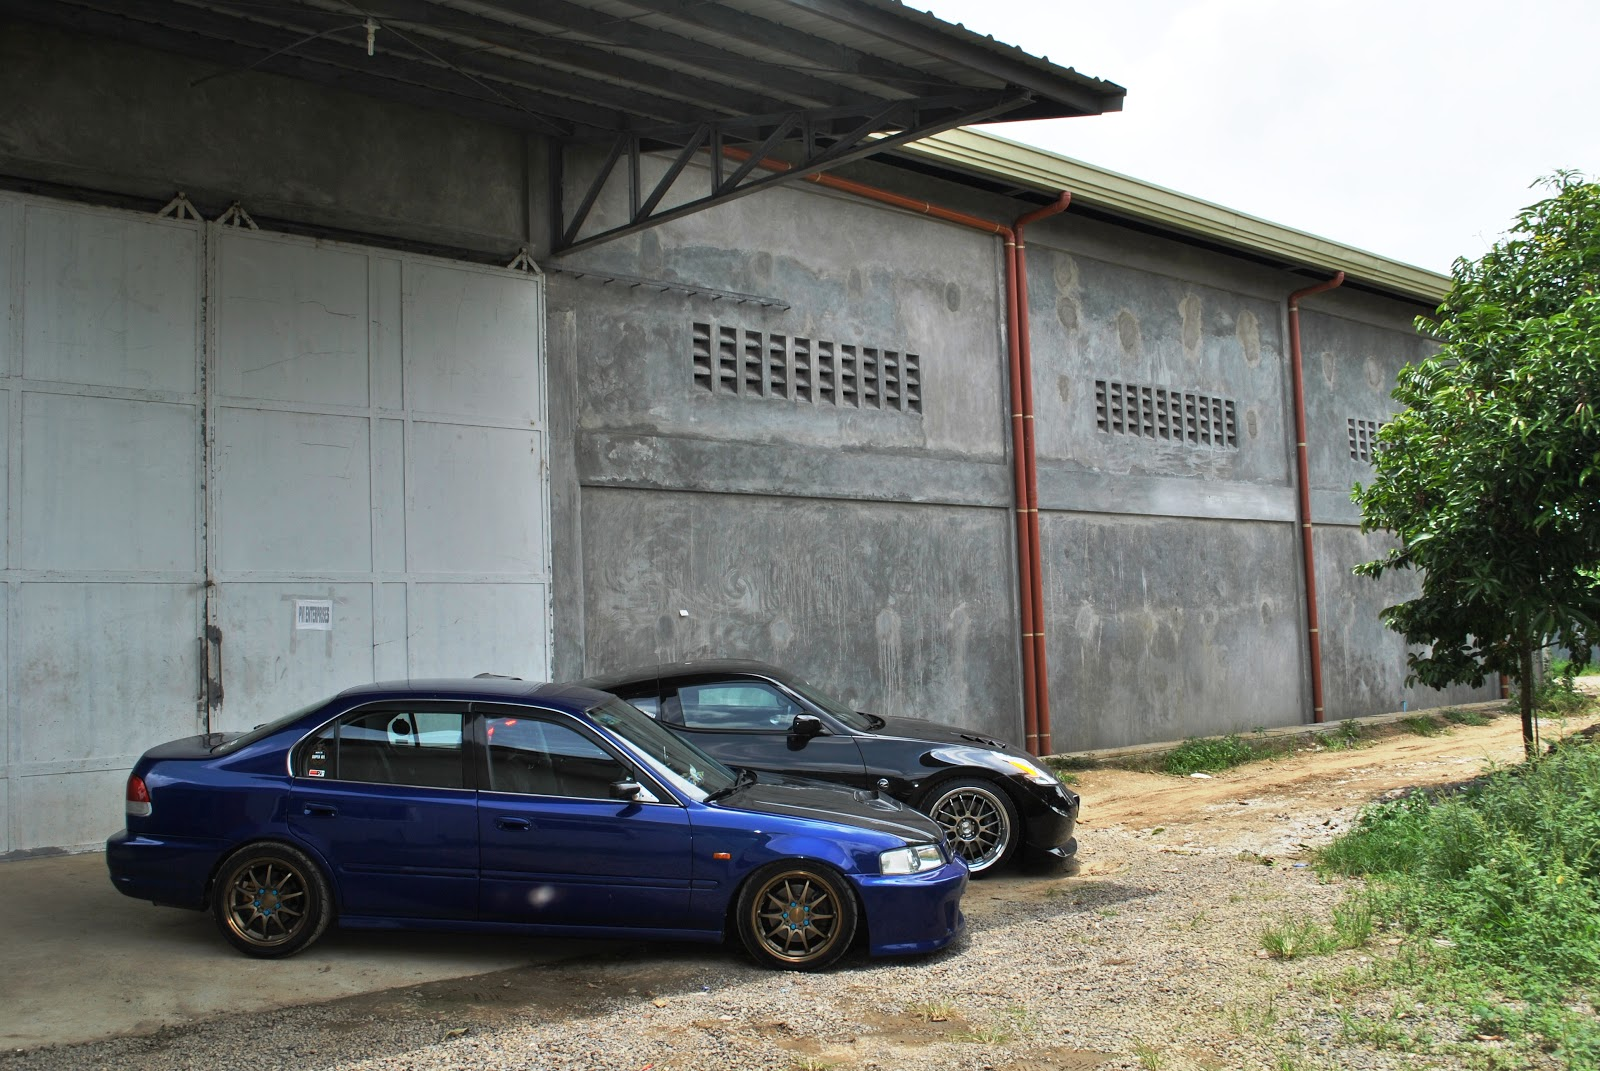 Reader 39 s car patrick 39 s 850hp garage farmofminds for Garage patrick auto meyzieu